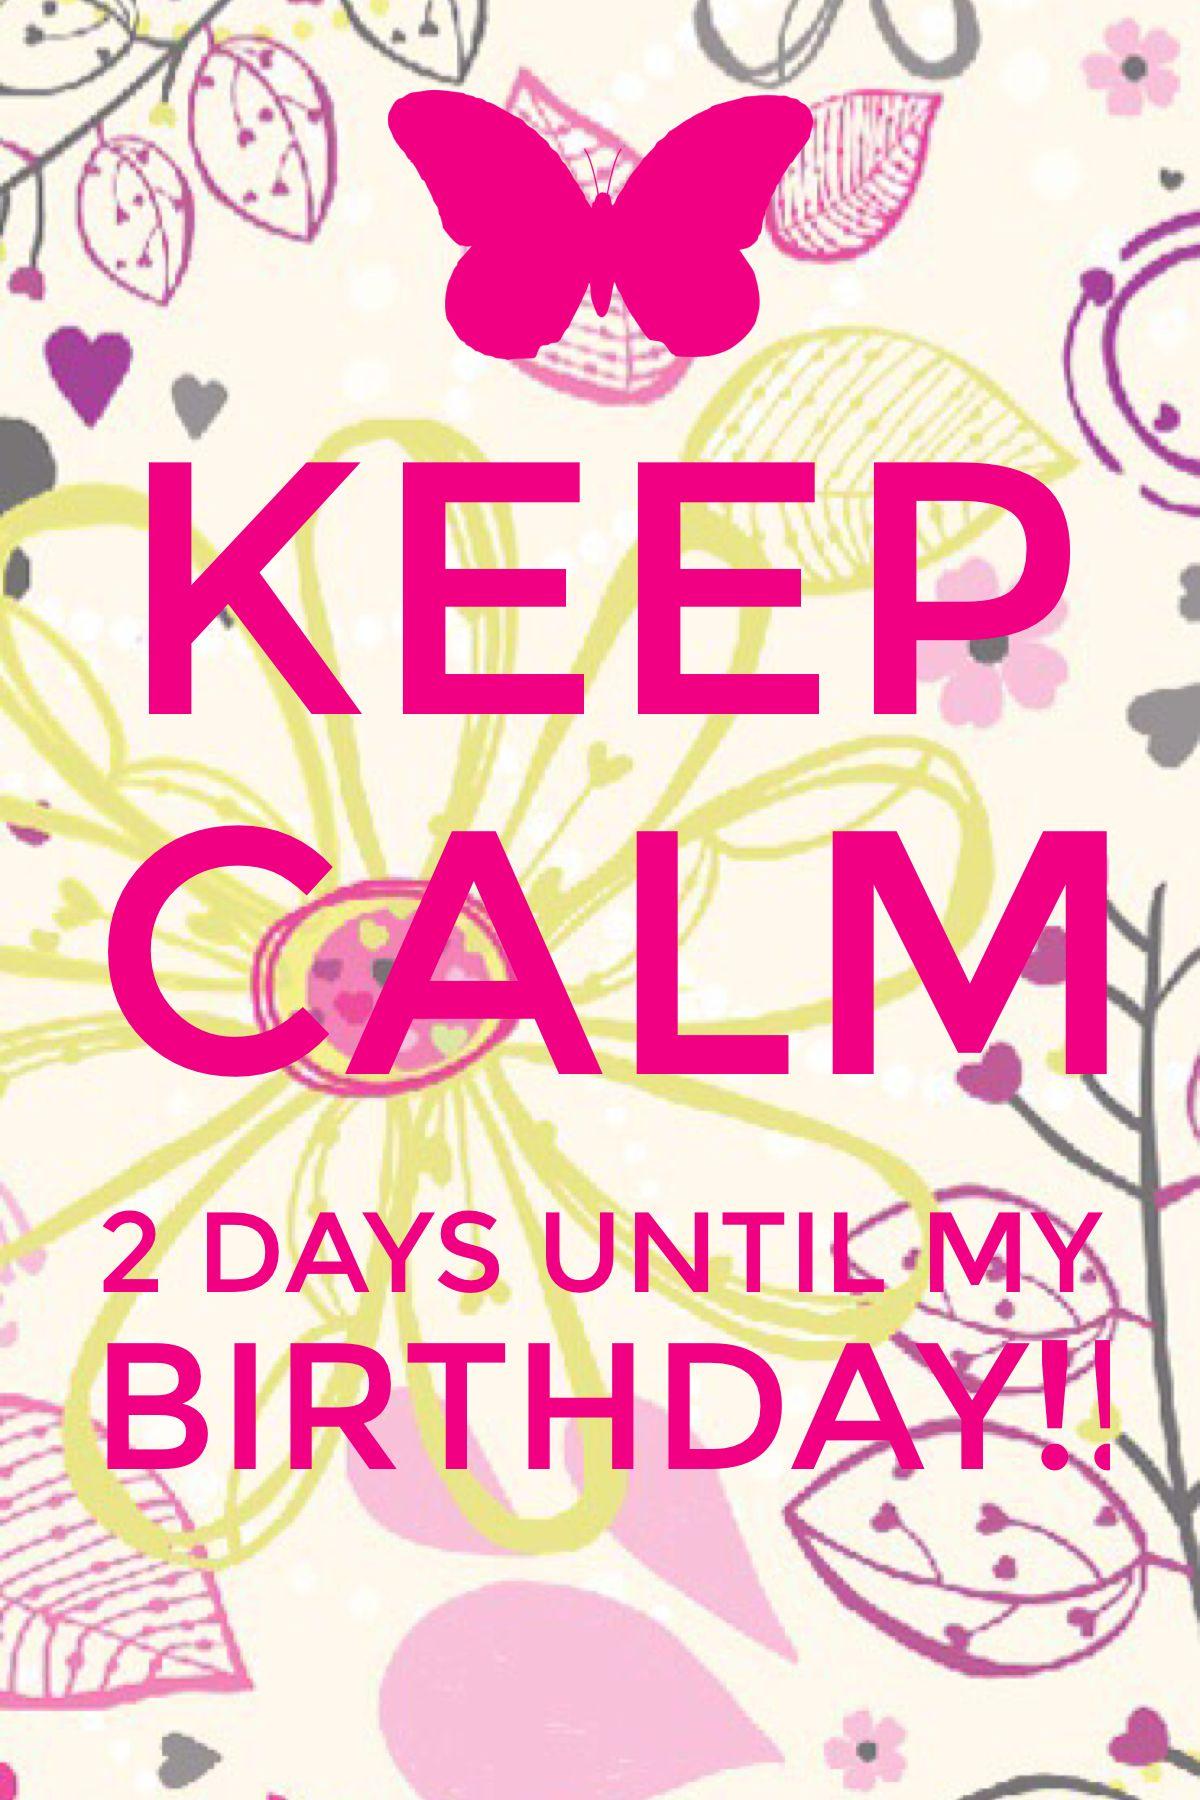 Keep Calm 2 days until my Birthday!! I'm gonna be 40